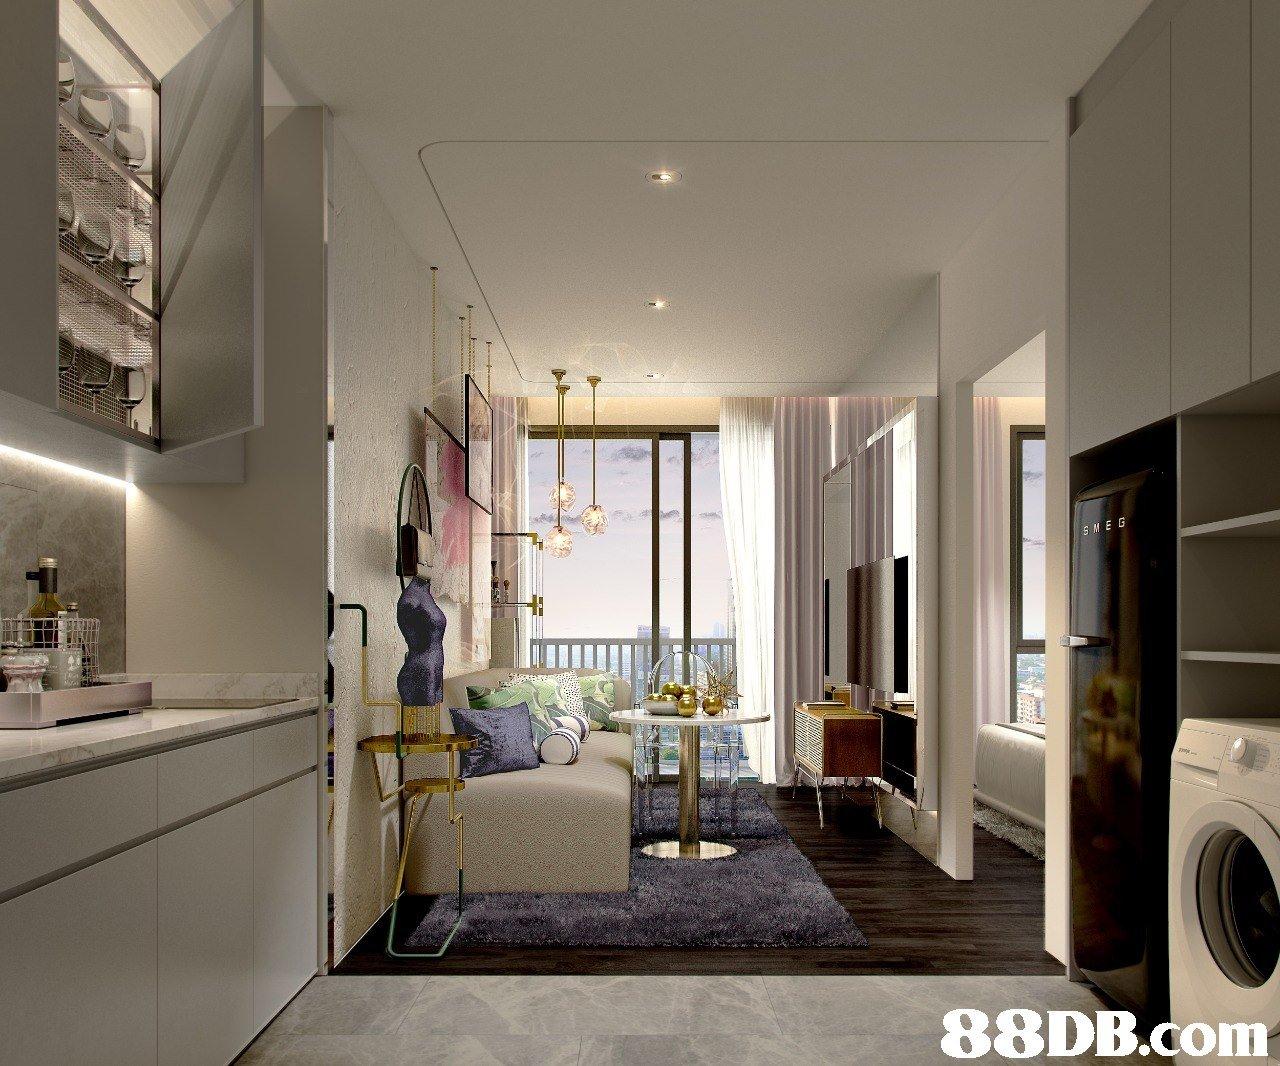 5 ME G   Room,Property,Interior design,Ceiling,Building